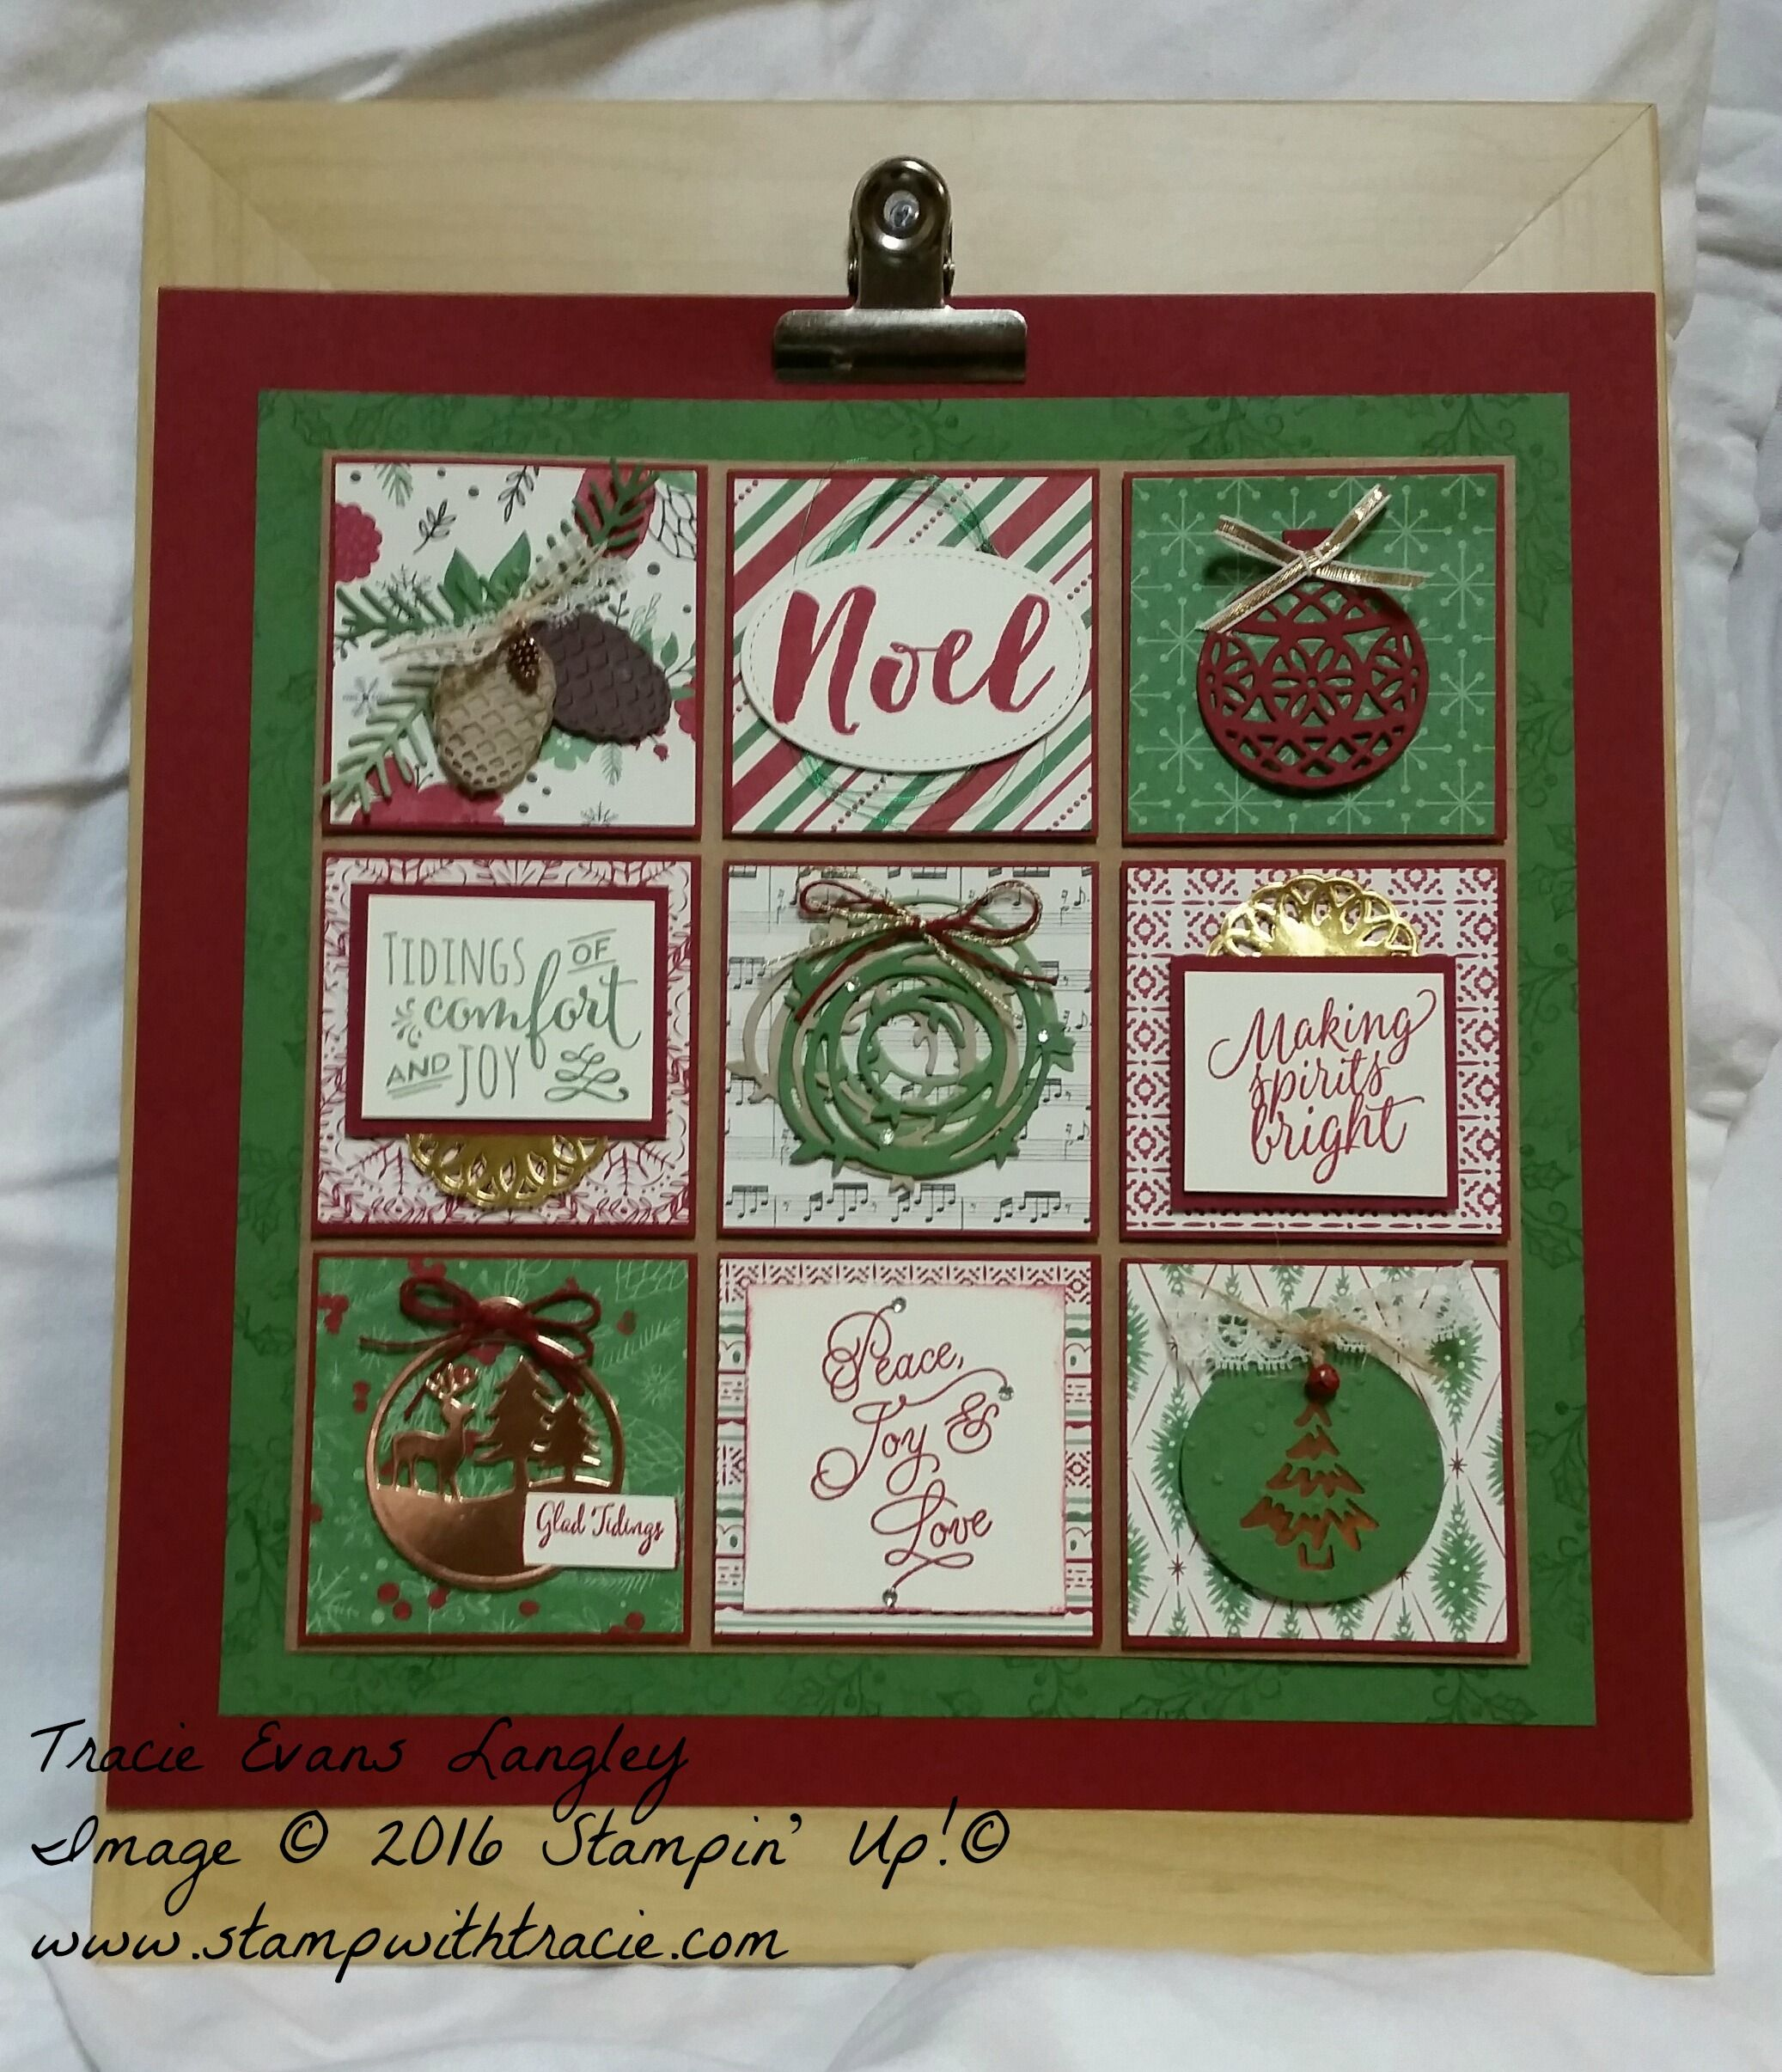 Paper Craft Crew Challenge 221 - Holiday Sampler